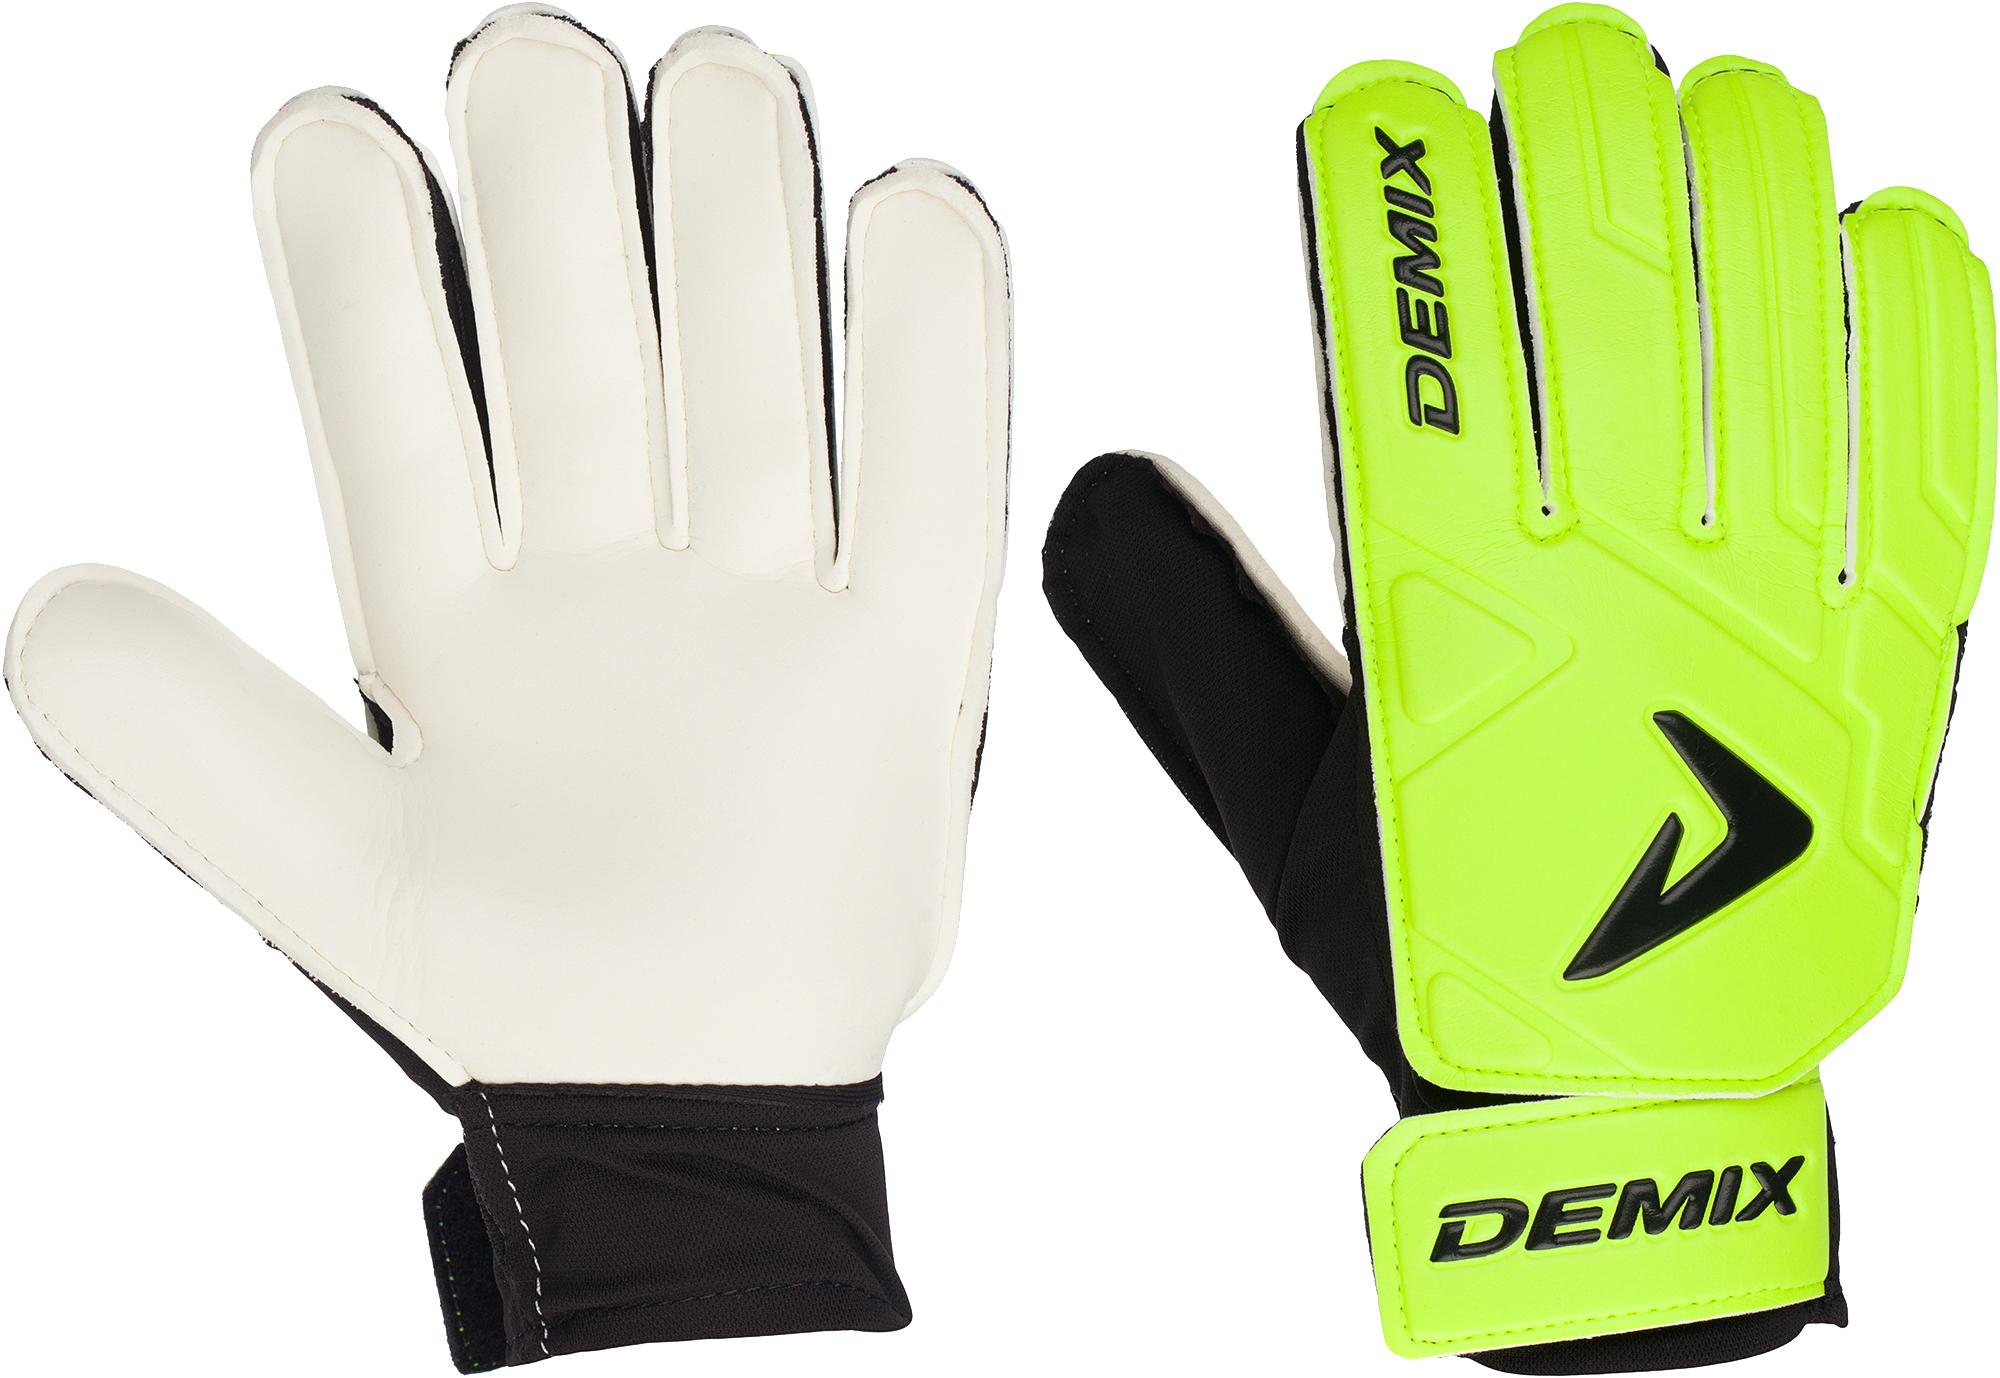 Demix Перчатки вратарские детские , размер 4